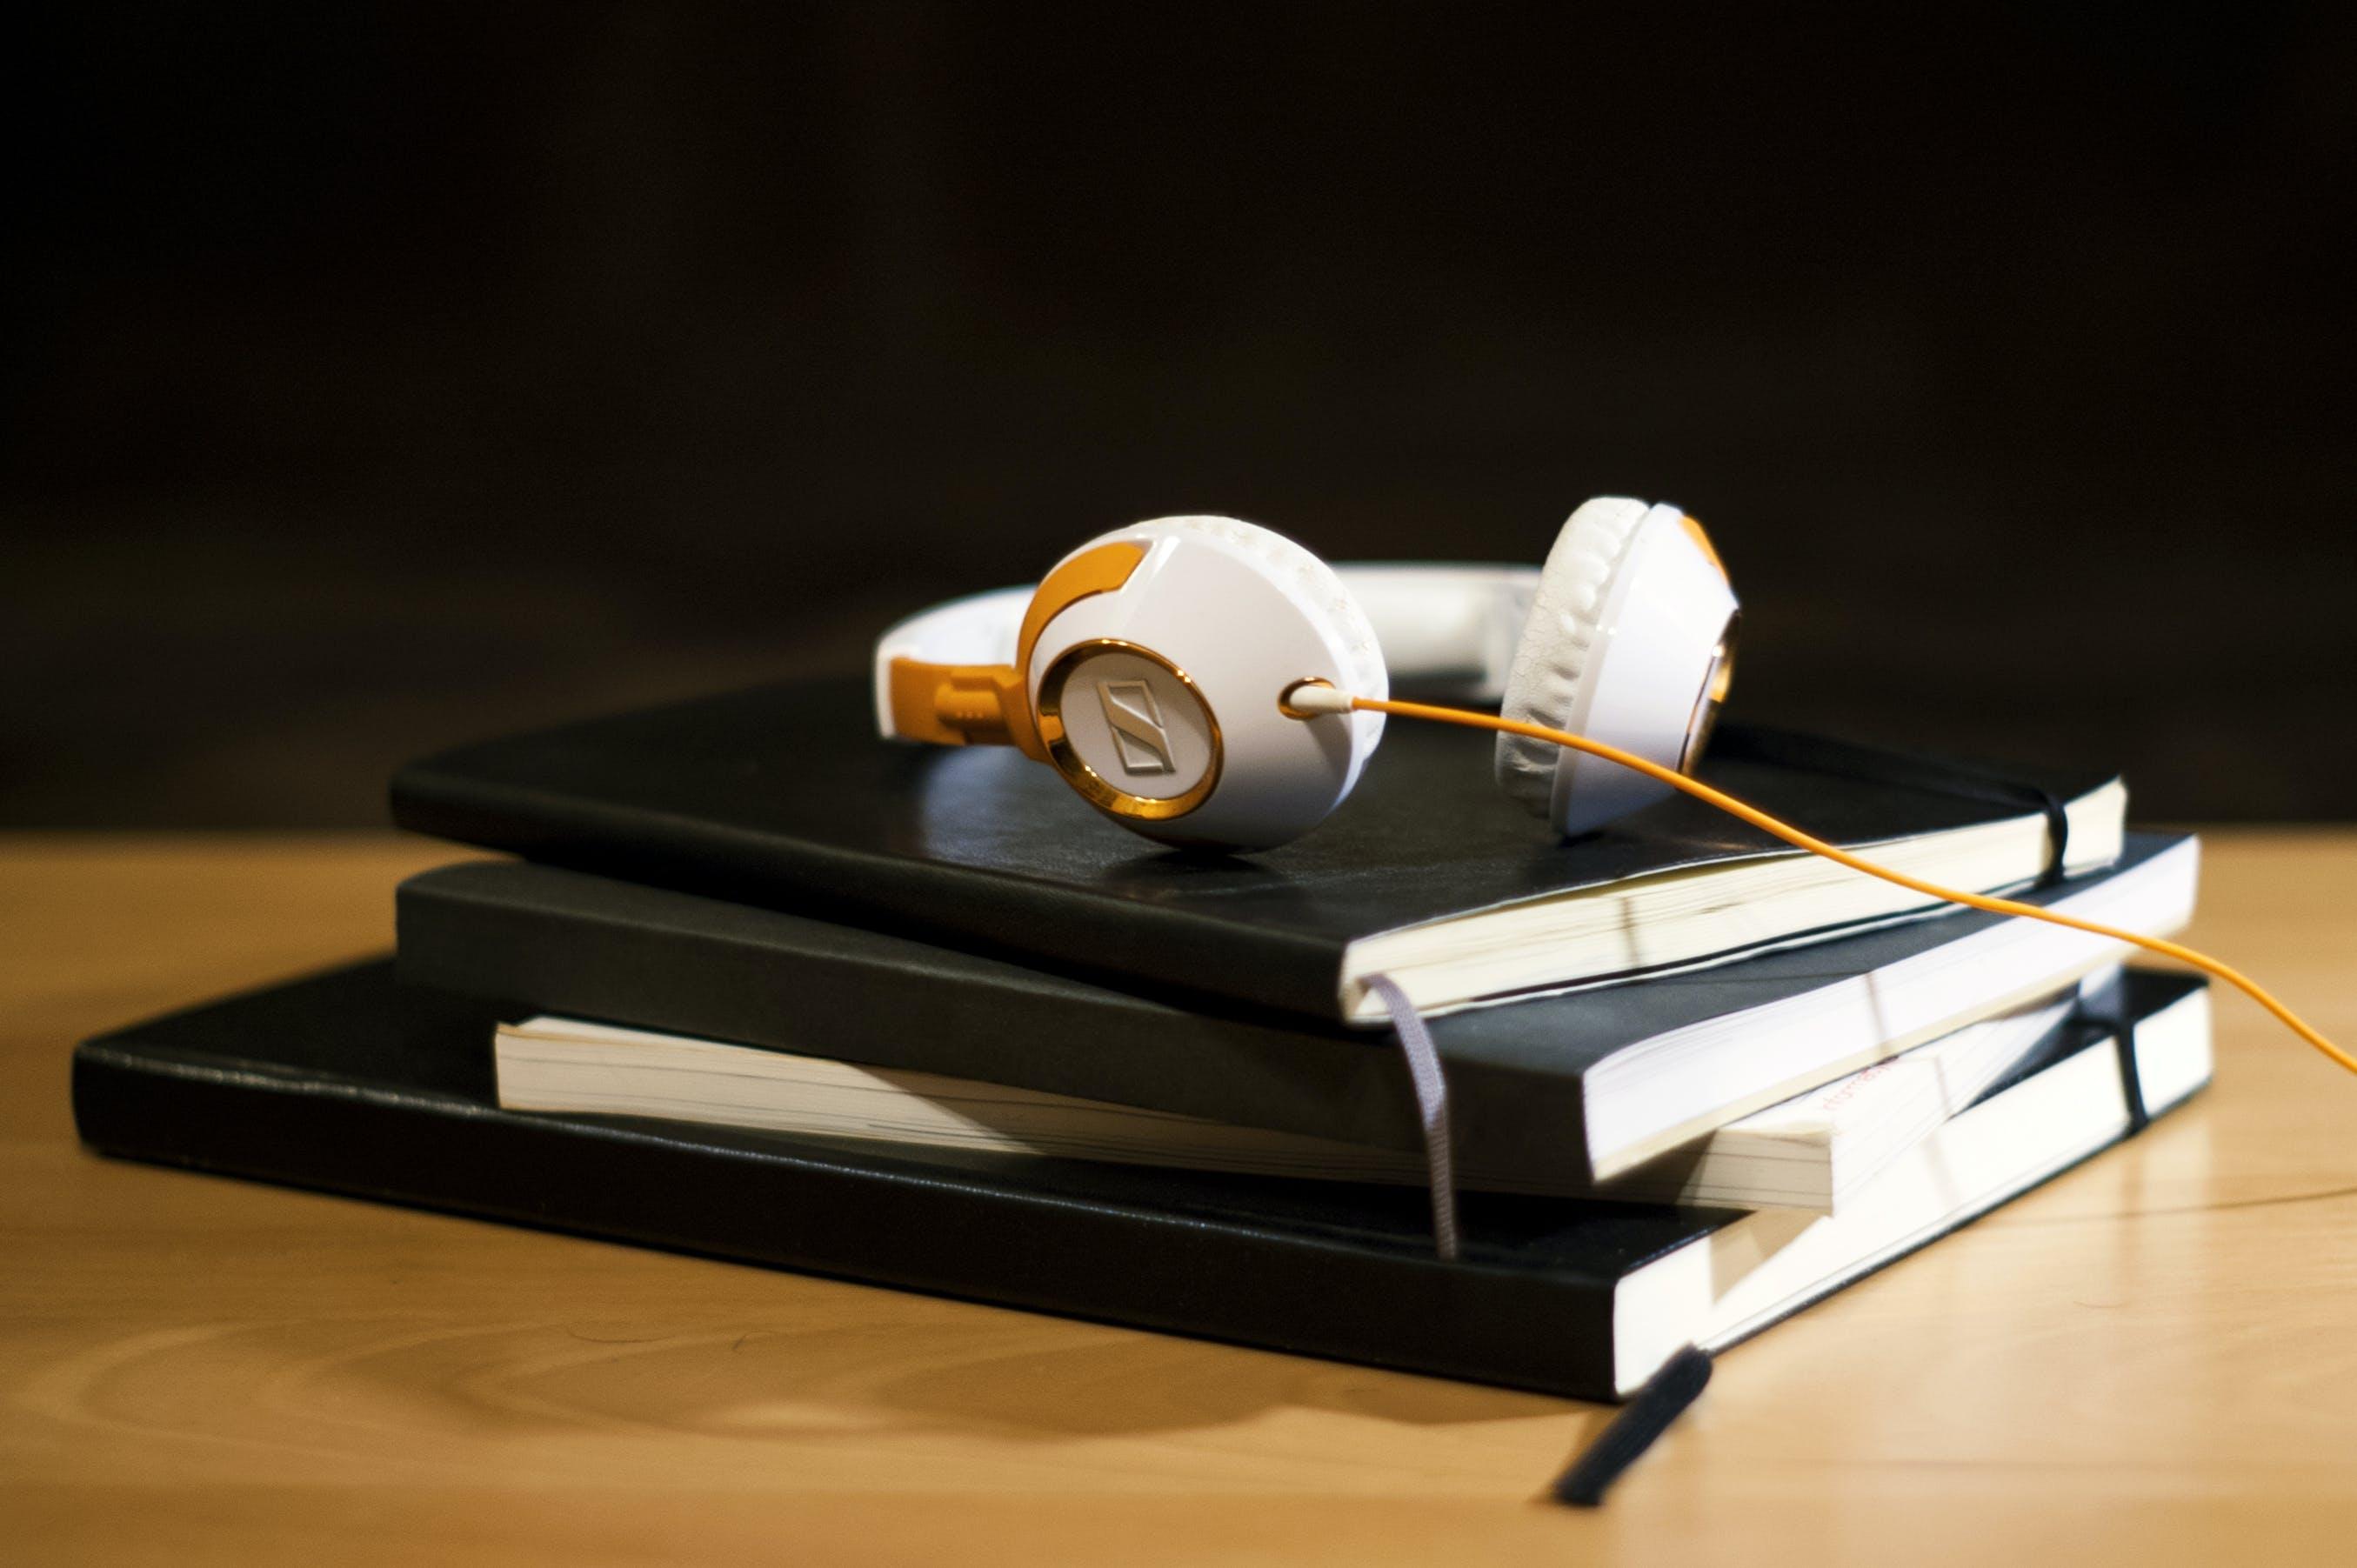 Free stock photo of night, books, headphones